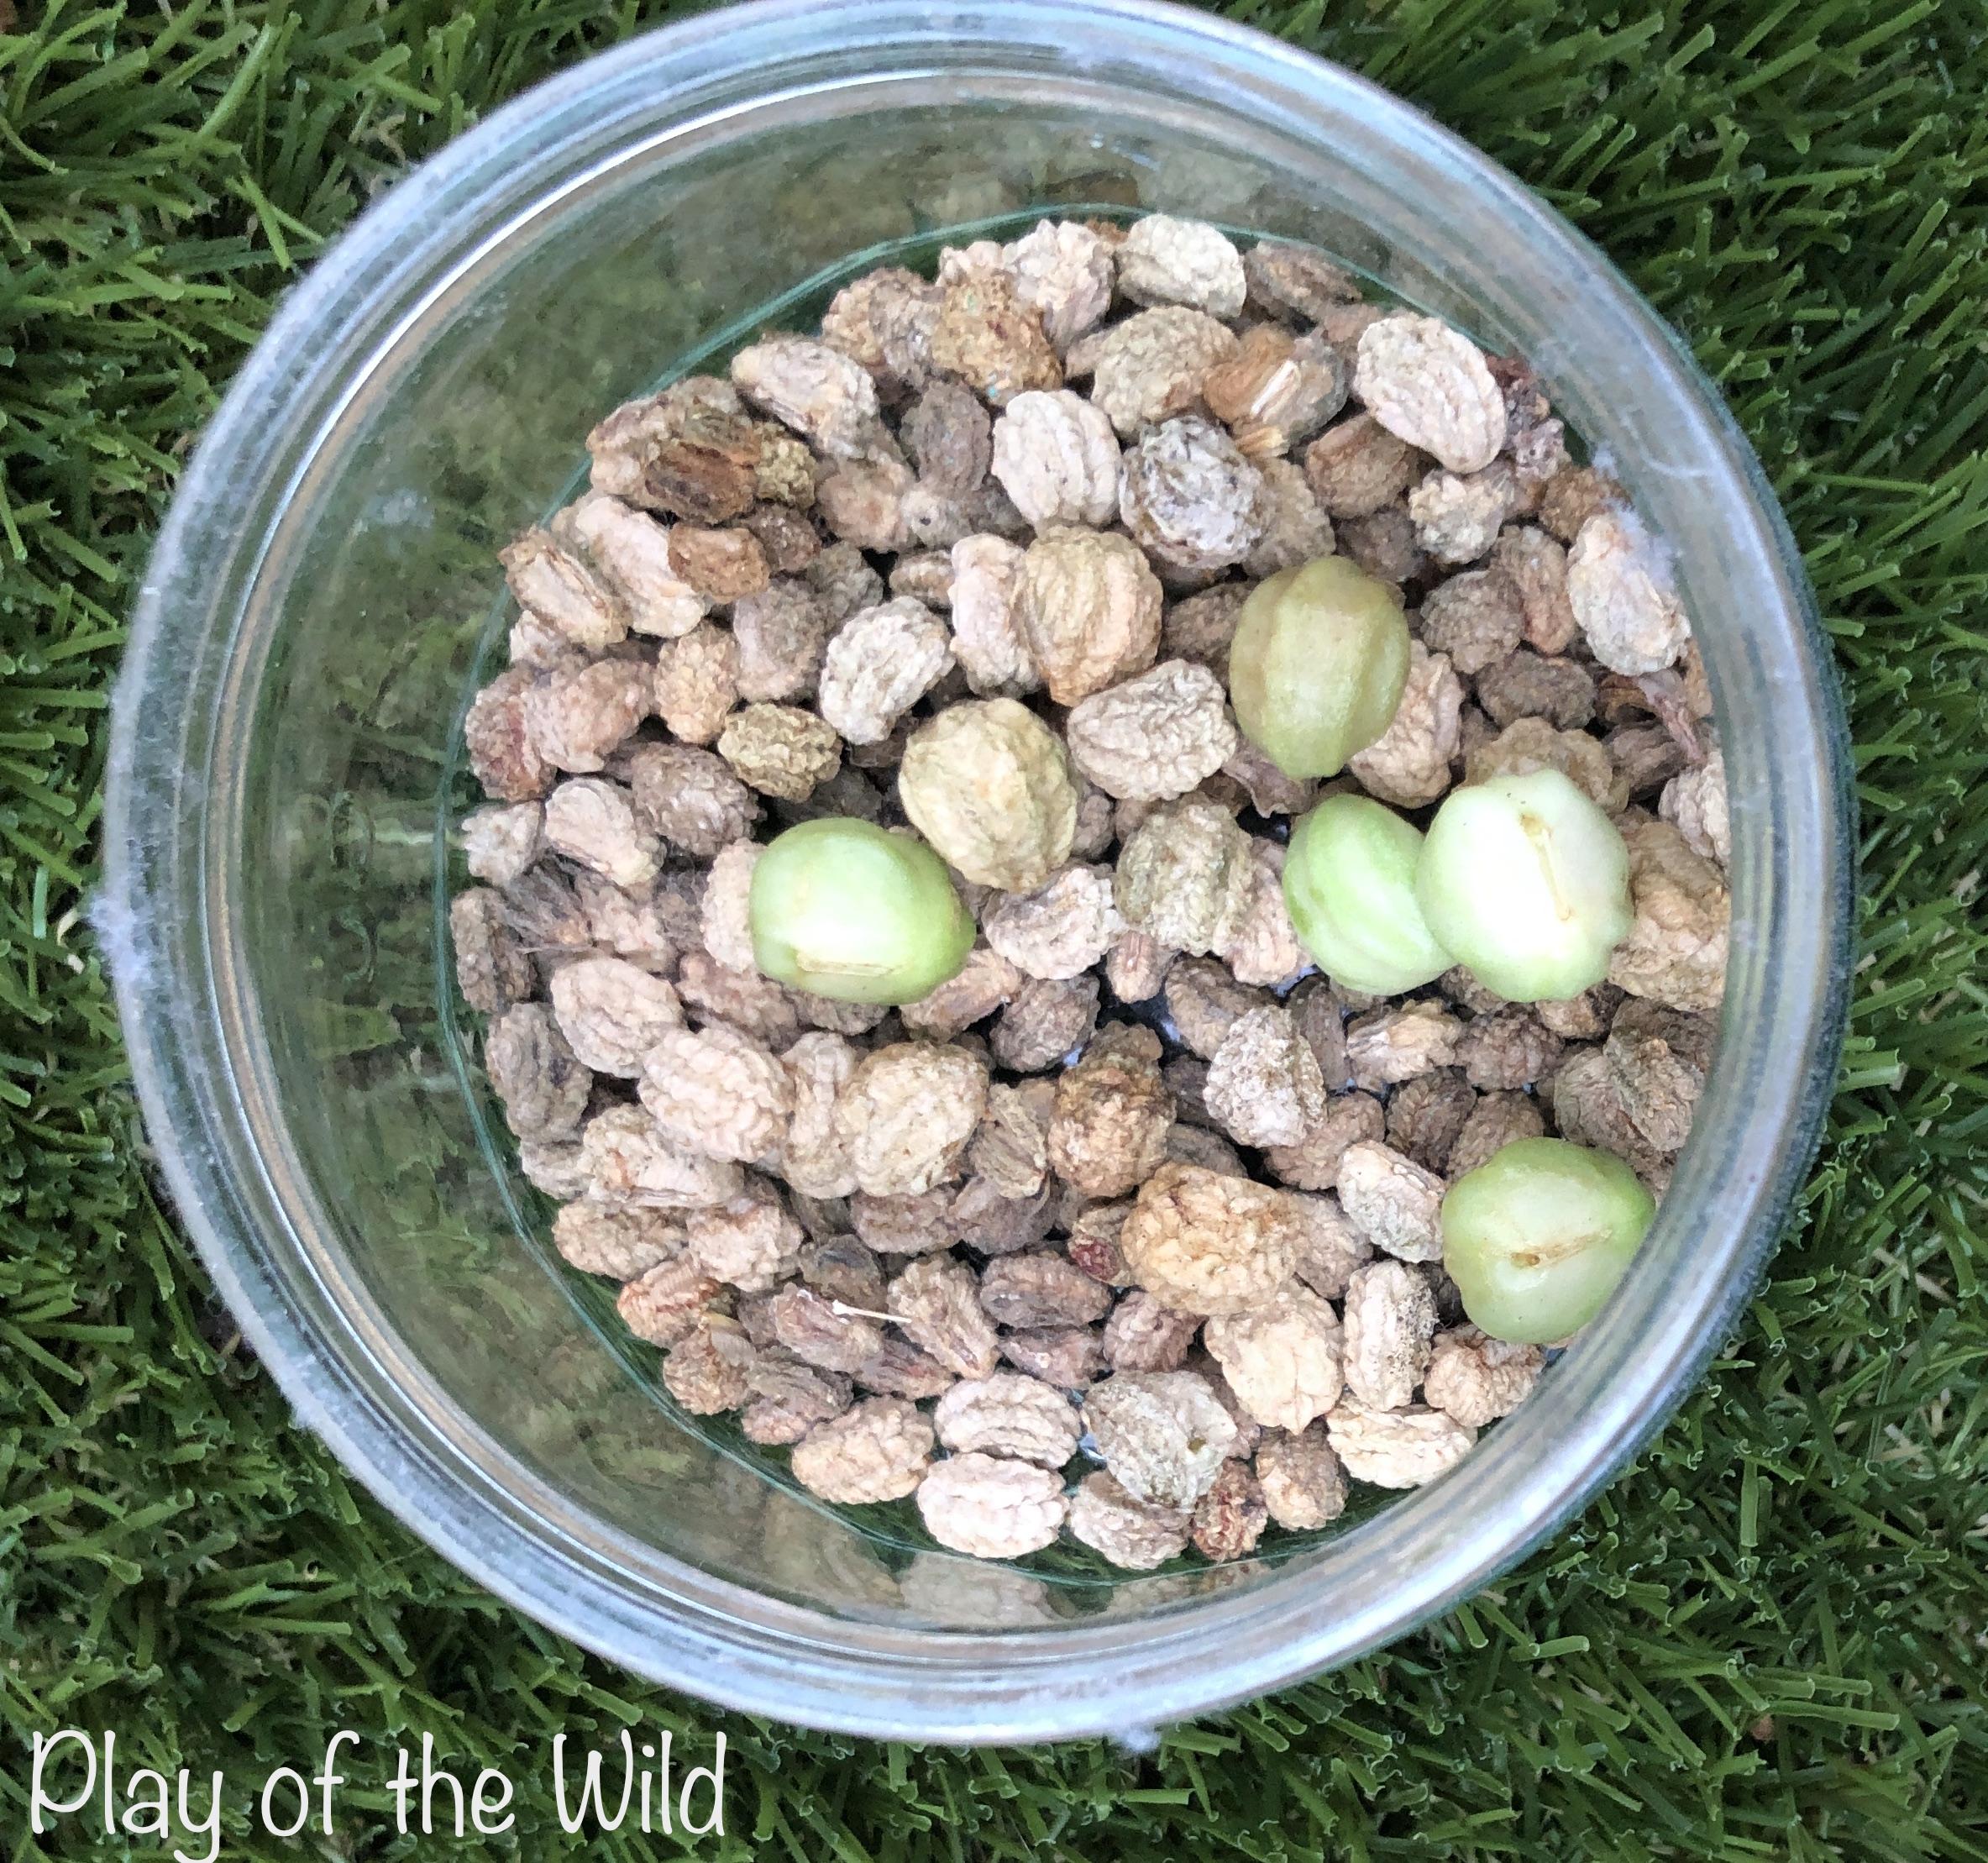 Nasturtium seeds collected by children.